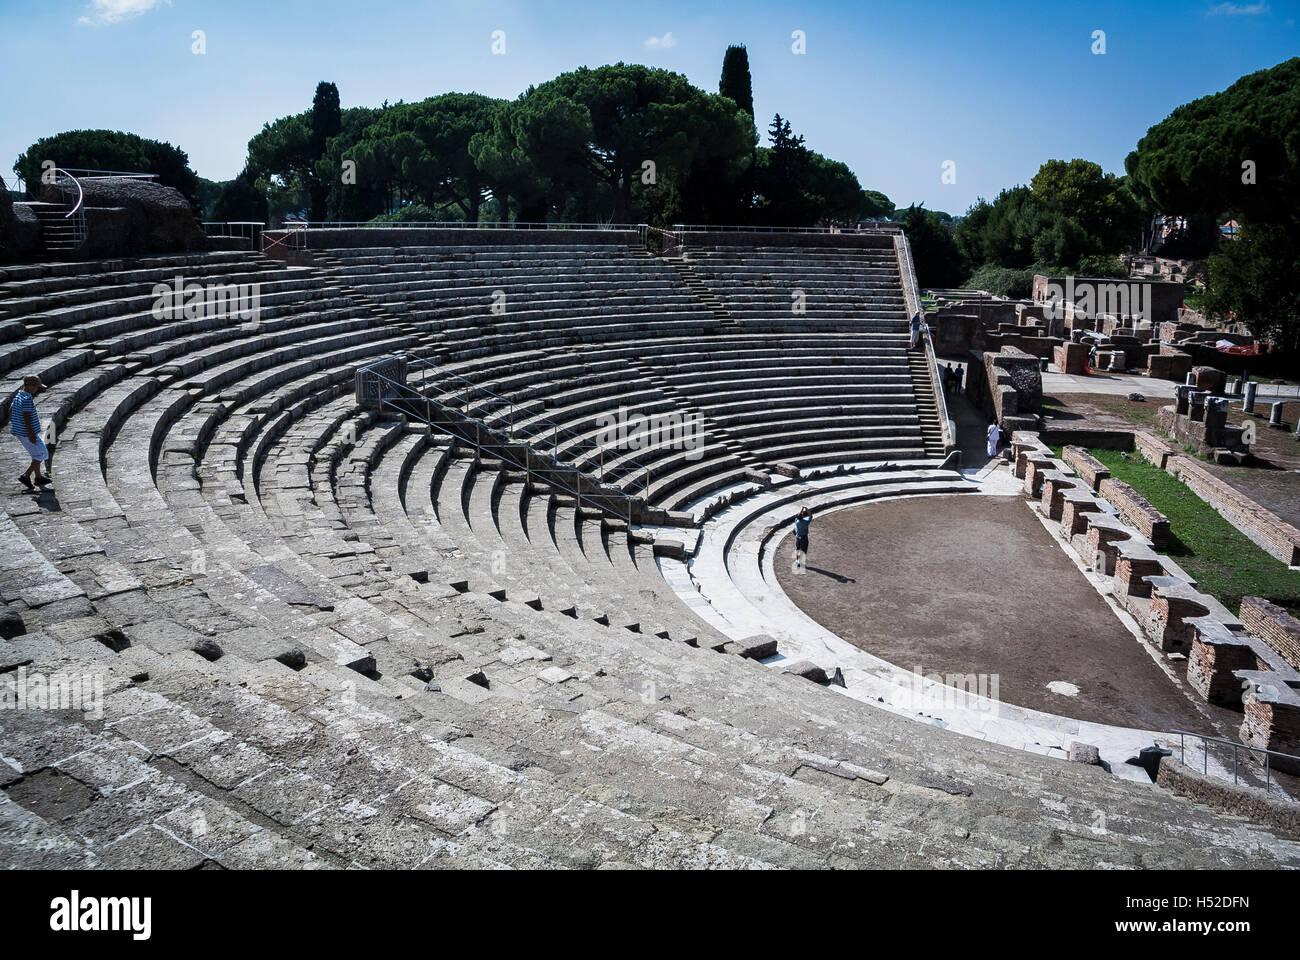 Teatro Ostia Antica Rome Italy - Stock Image